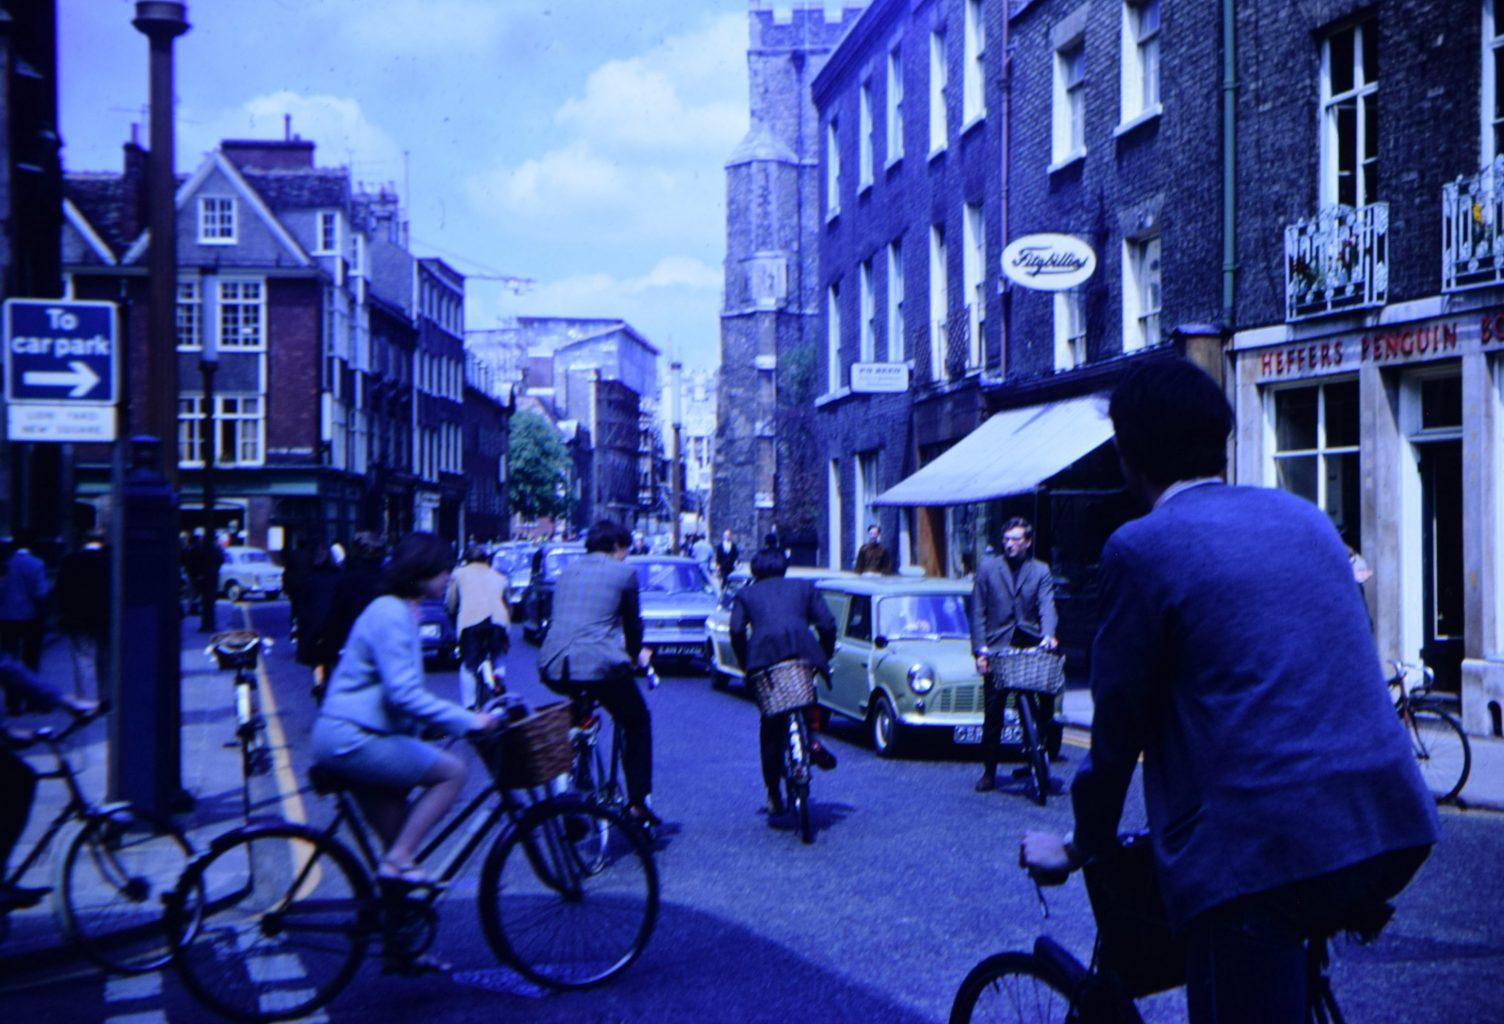 Street view of Fitzbillies in 1967